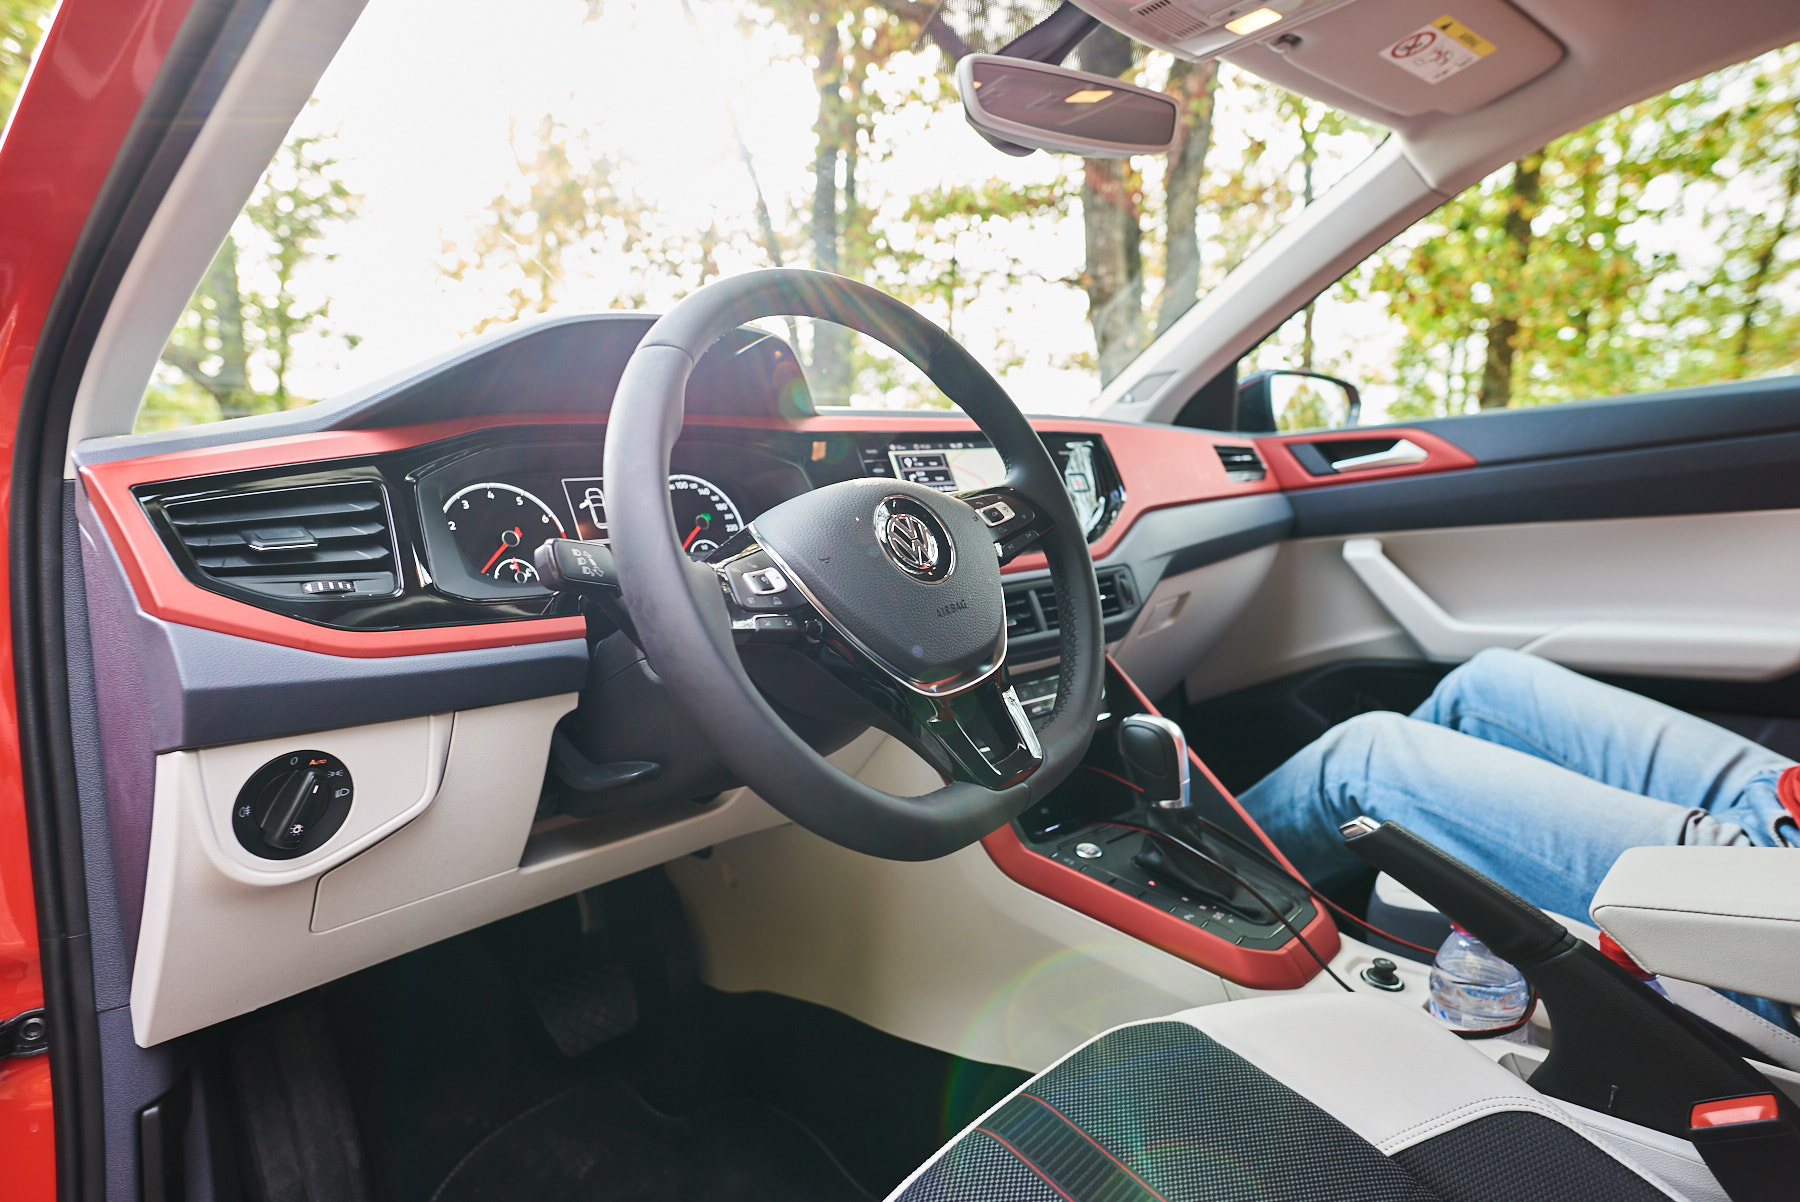 test nouvelle volkswagen polo l autre taille de golf diisign. Black Bedroom Furniture Sets. Home Design Ideas